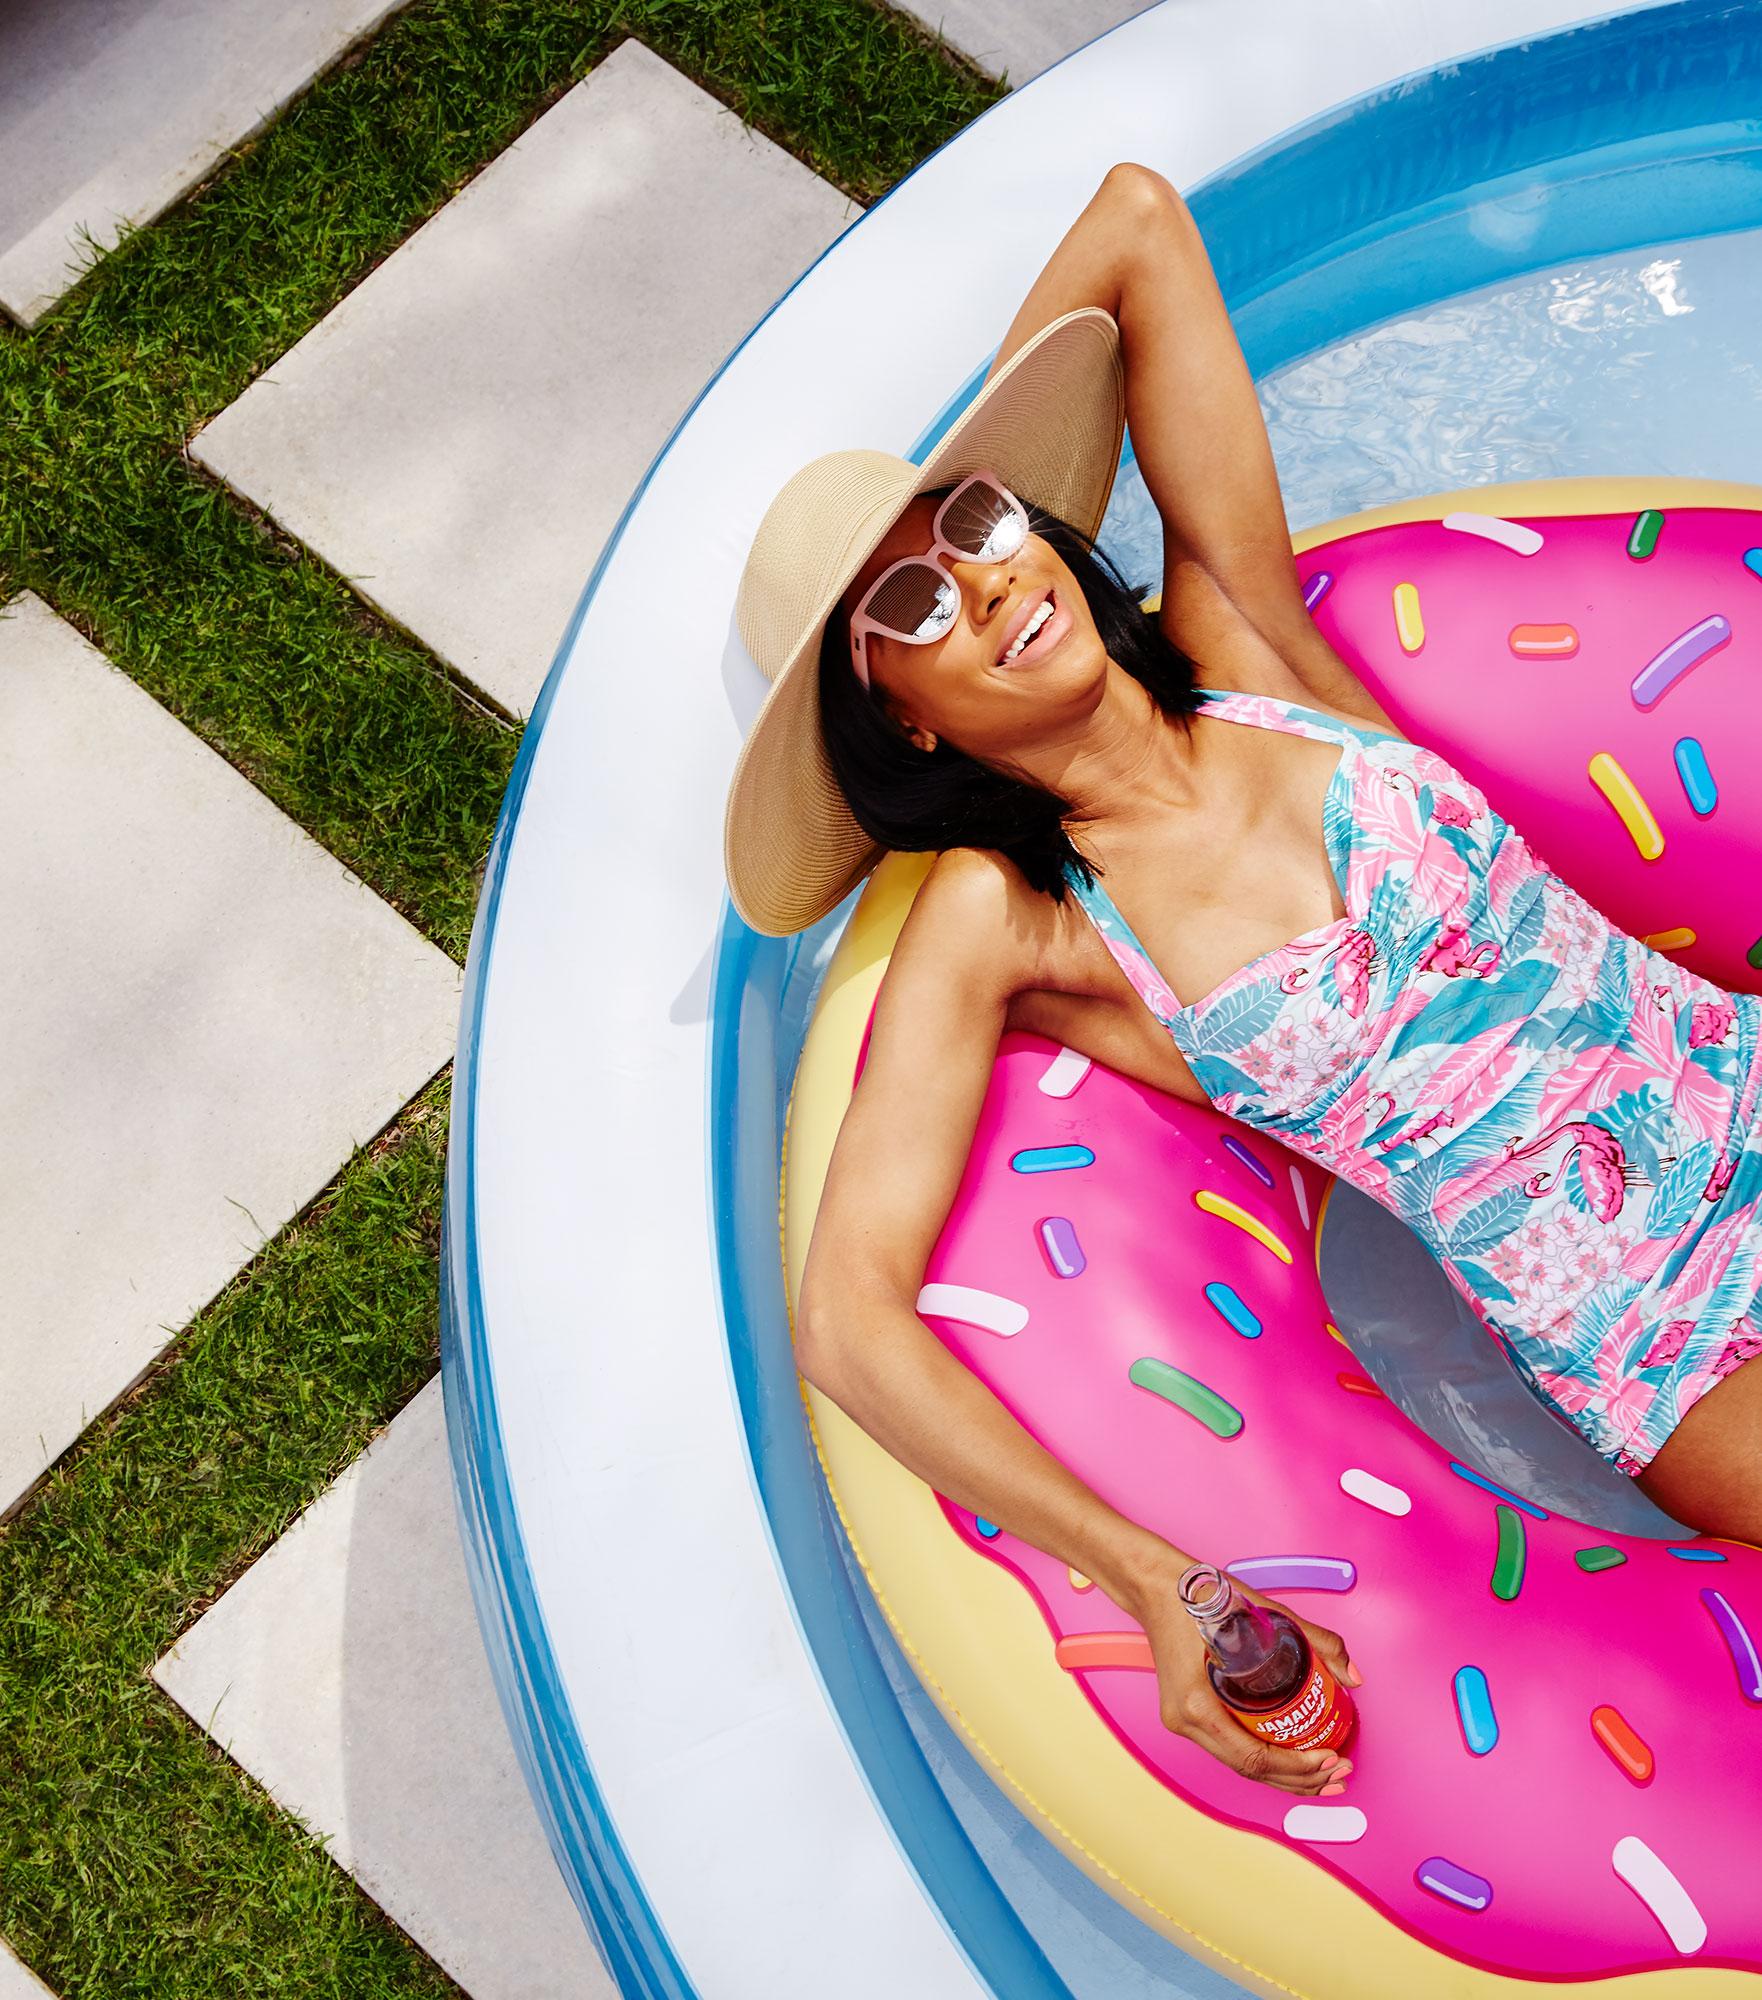 table magazine summer pool party u2014 janelle bendycki